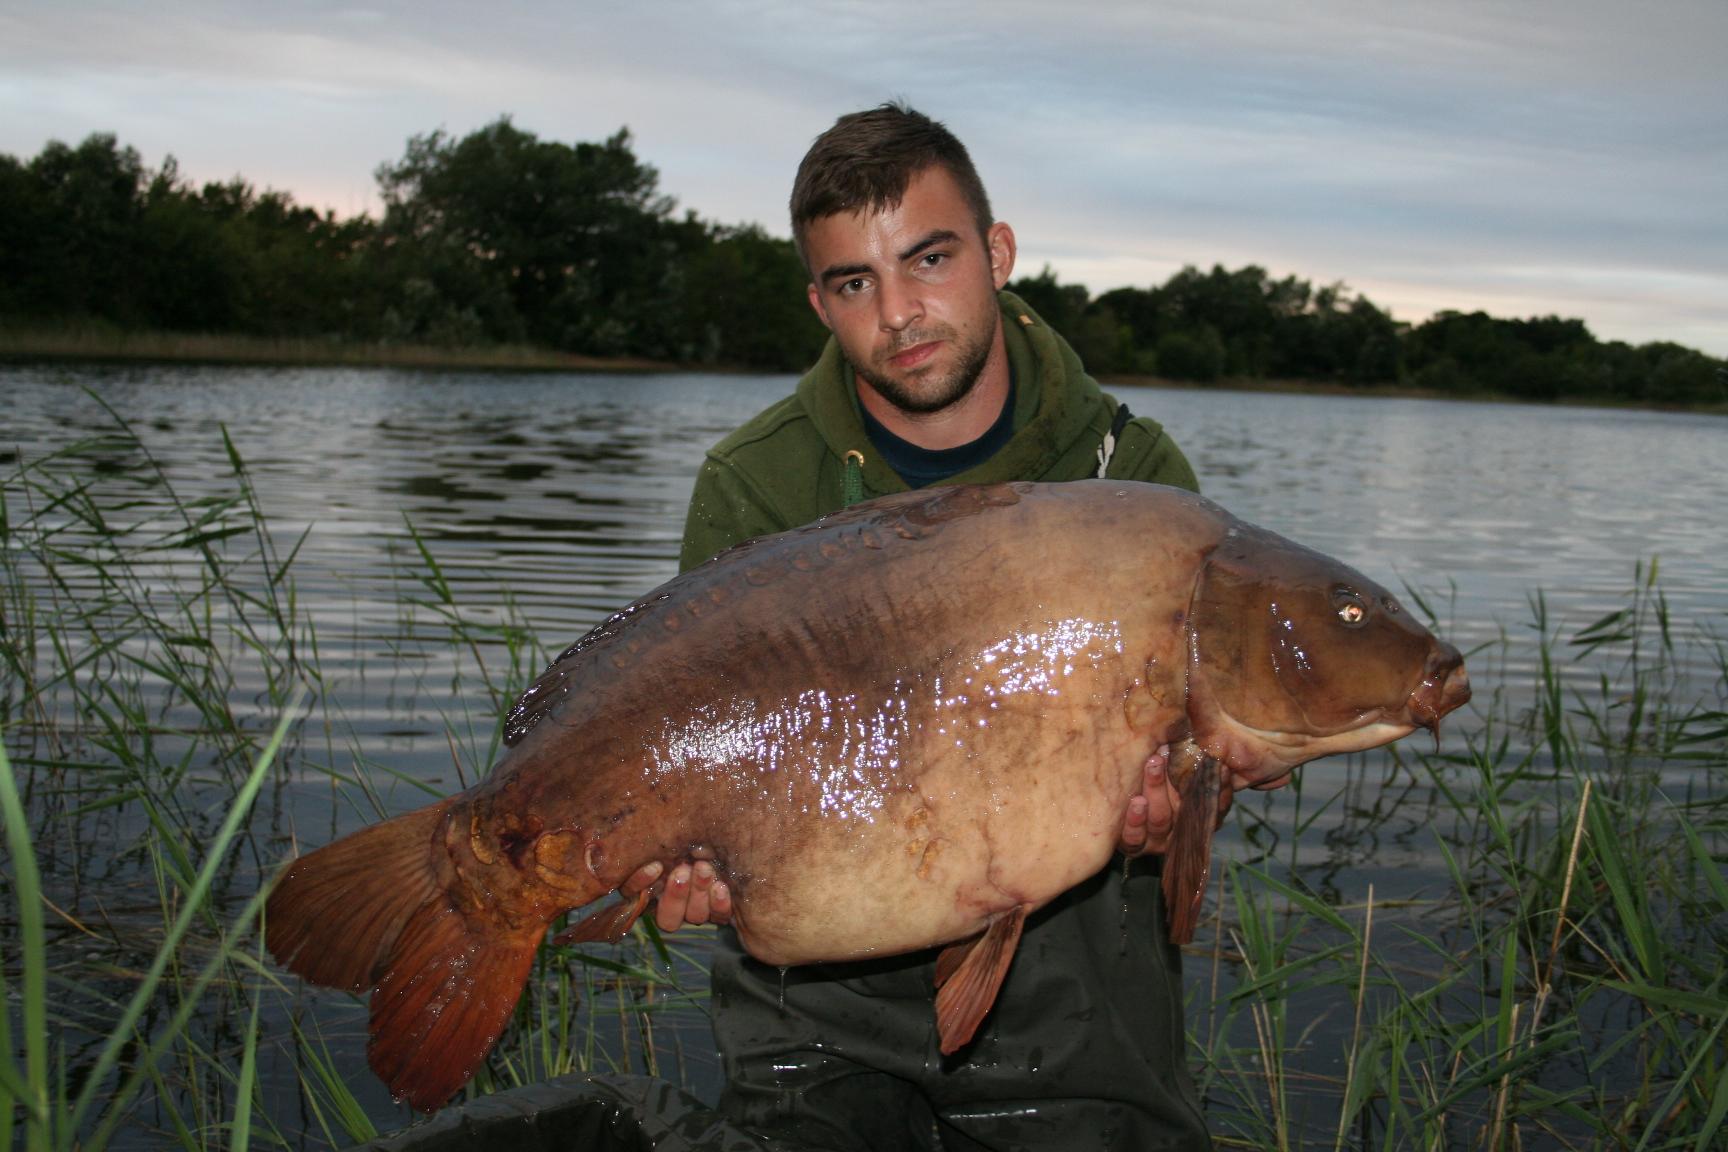 Near 50 lb carp from Essex Manor